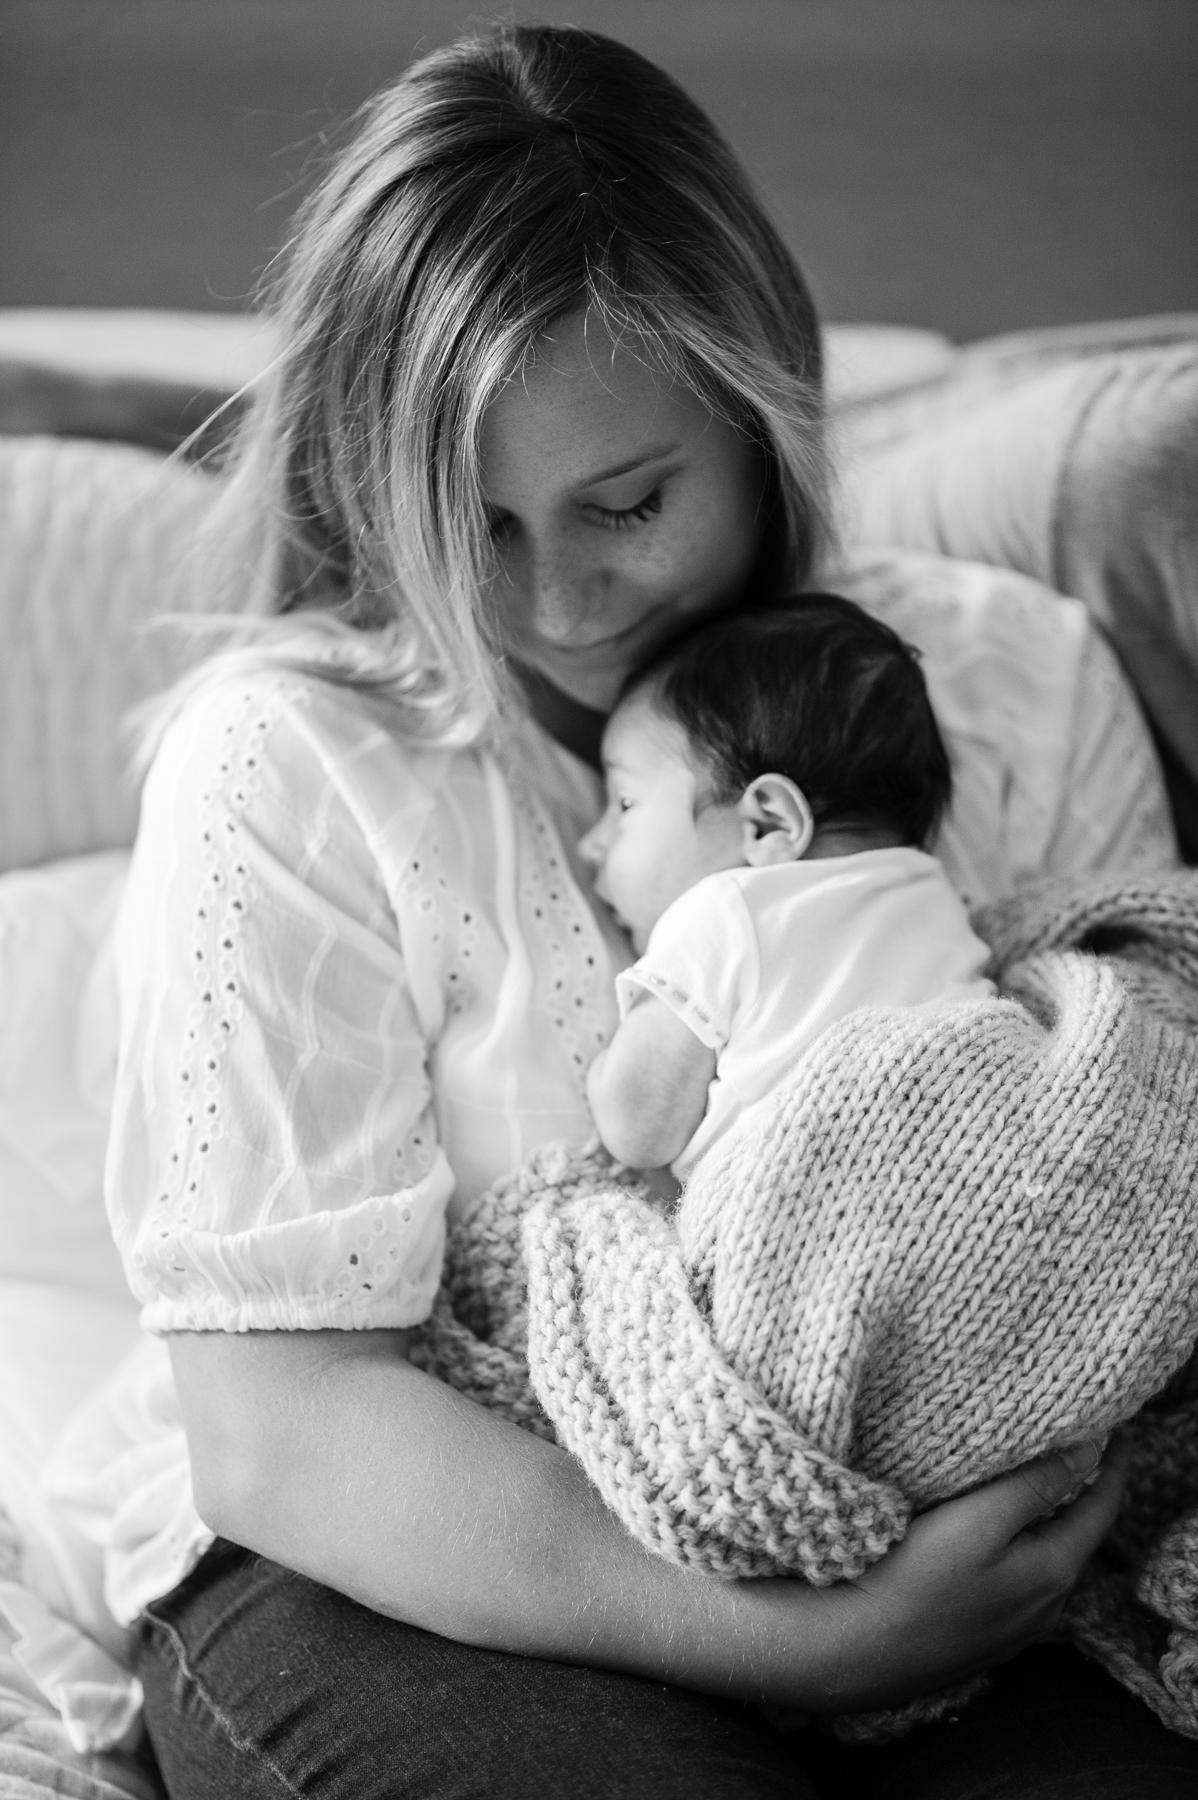 ClaireElisePhotography_Newborn-8.jpg